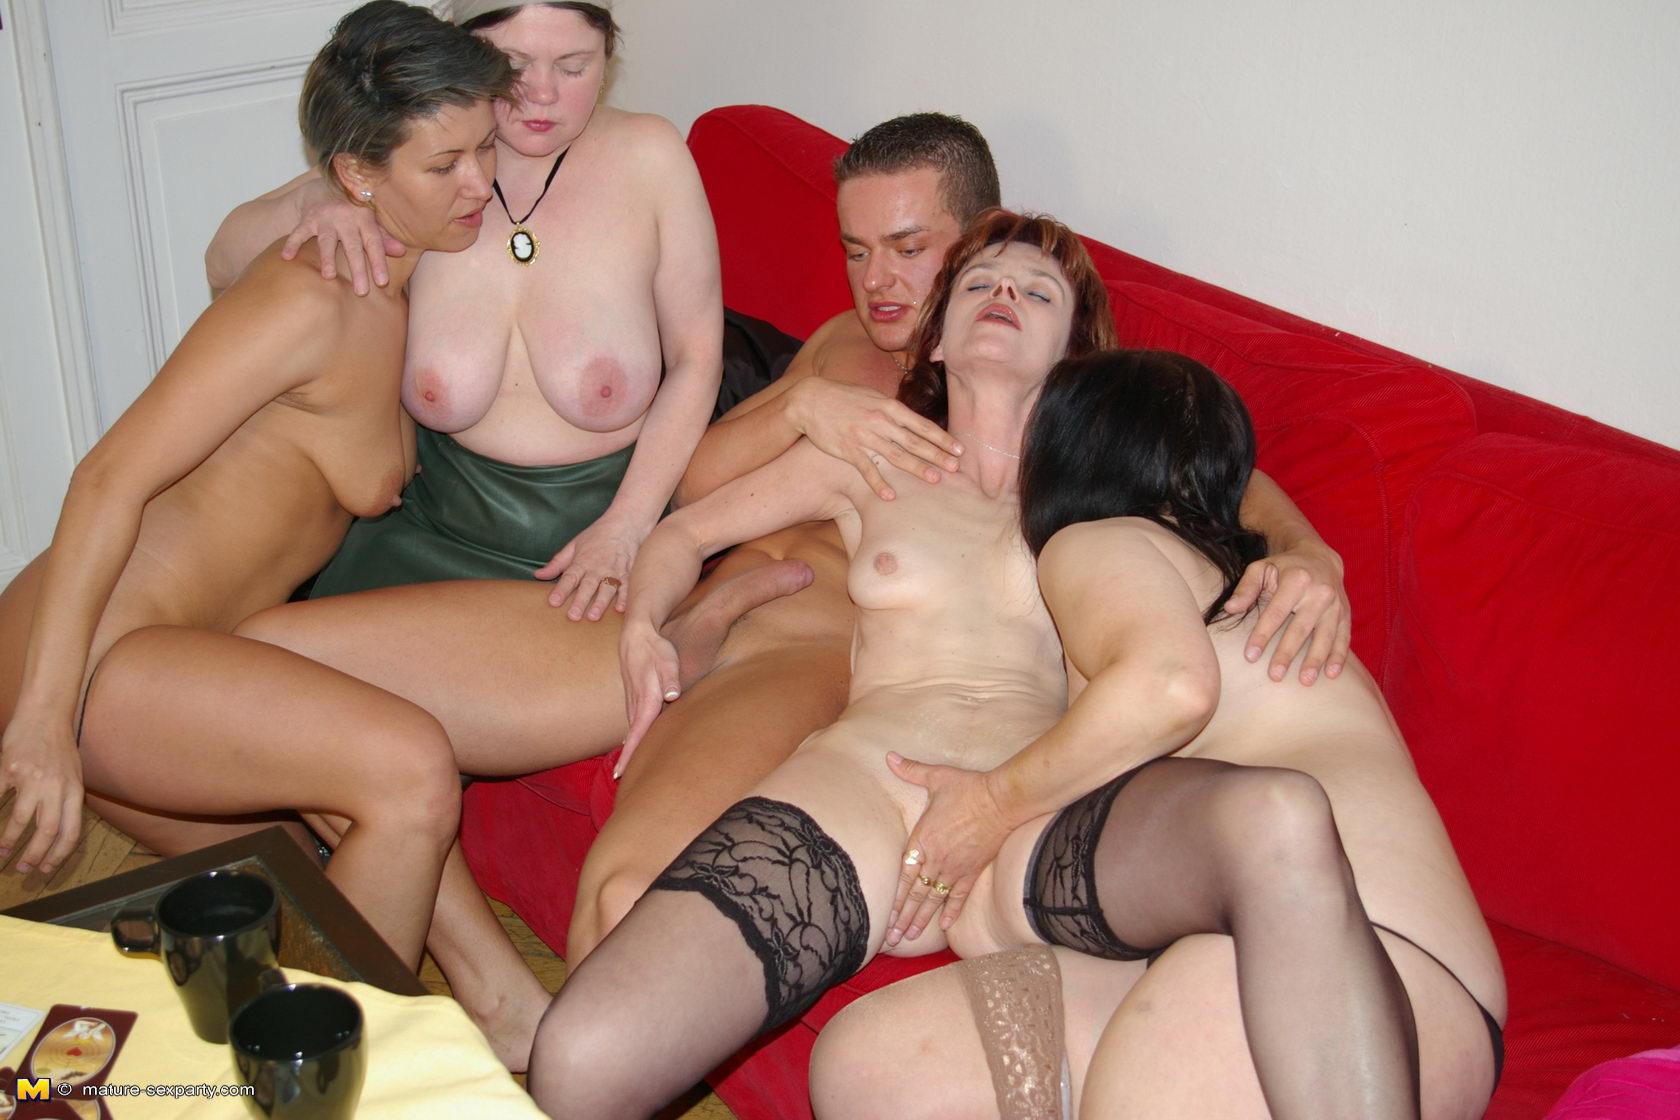 Фото секс патсан с зрелы женшина 4 фотография